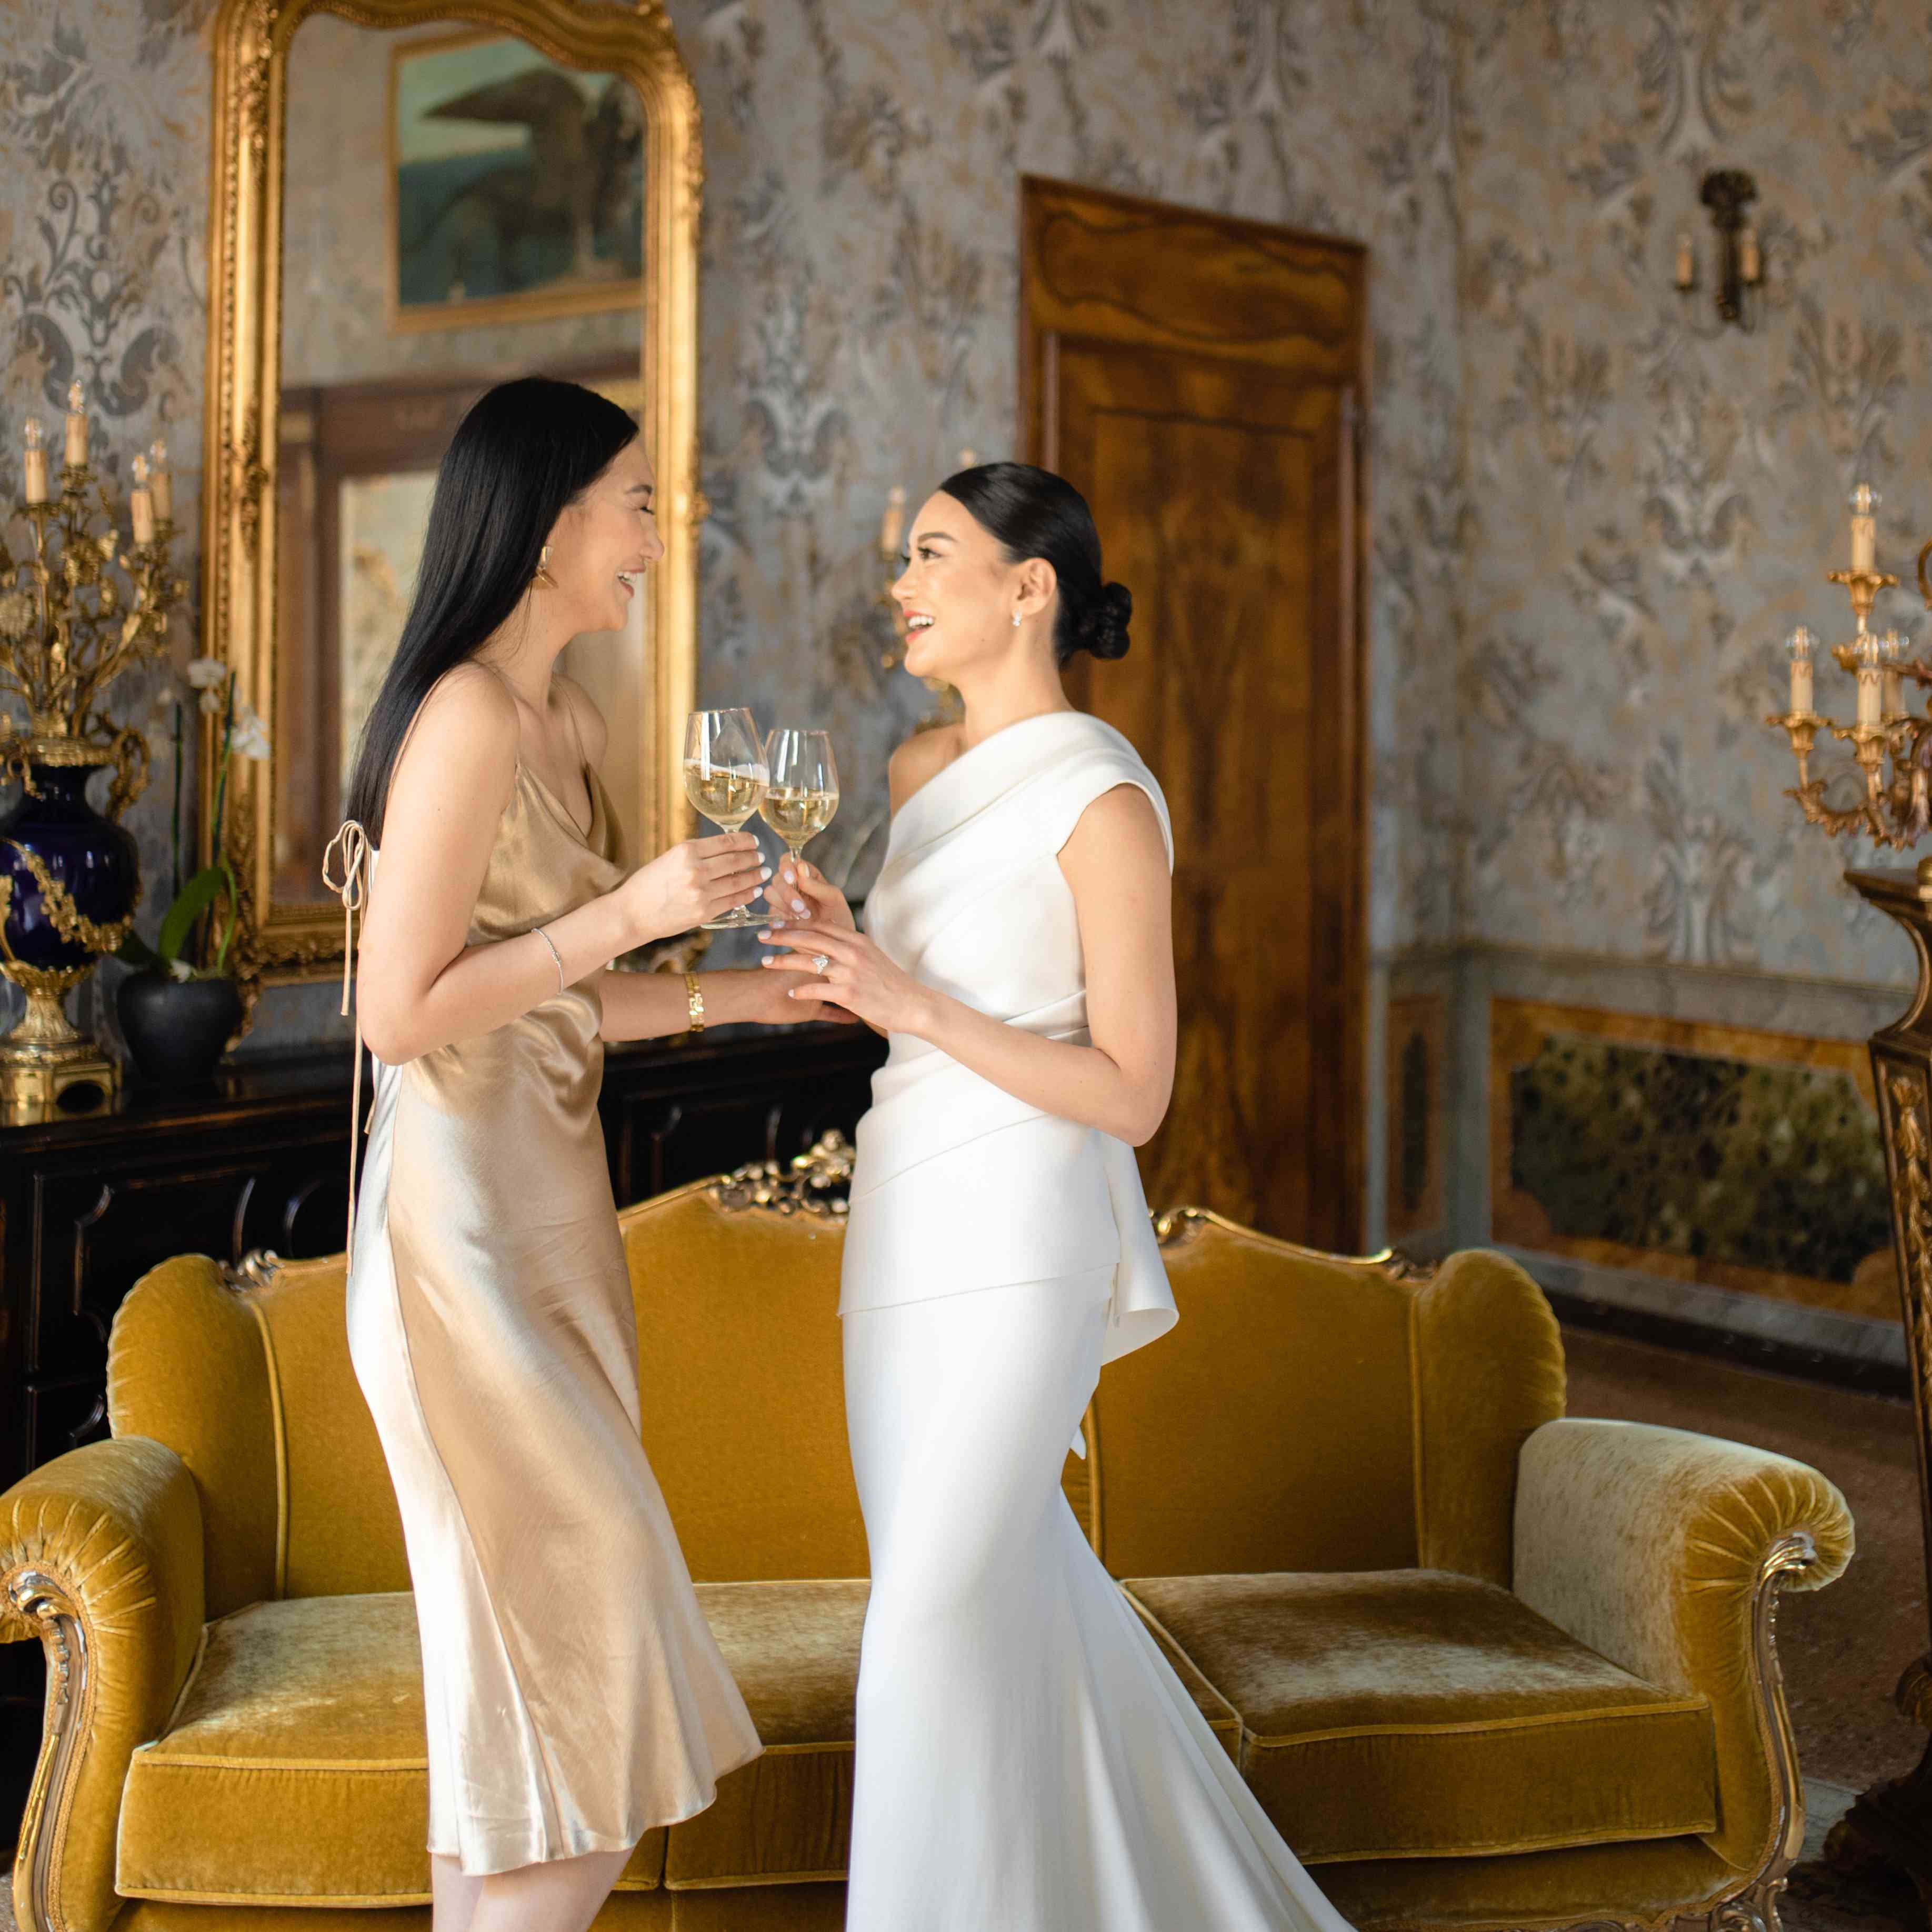 modern venice wedding, bride drinking wine with bridesmaid